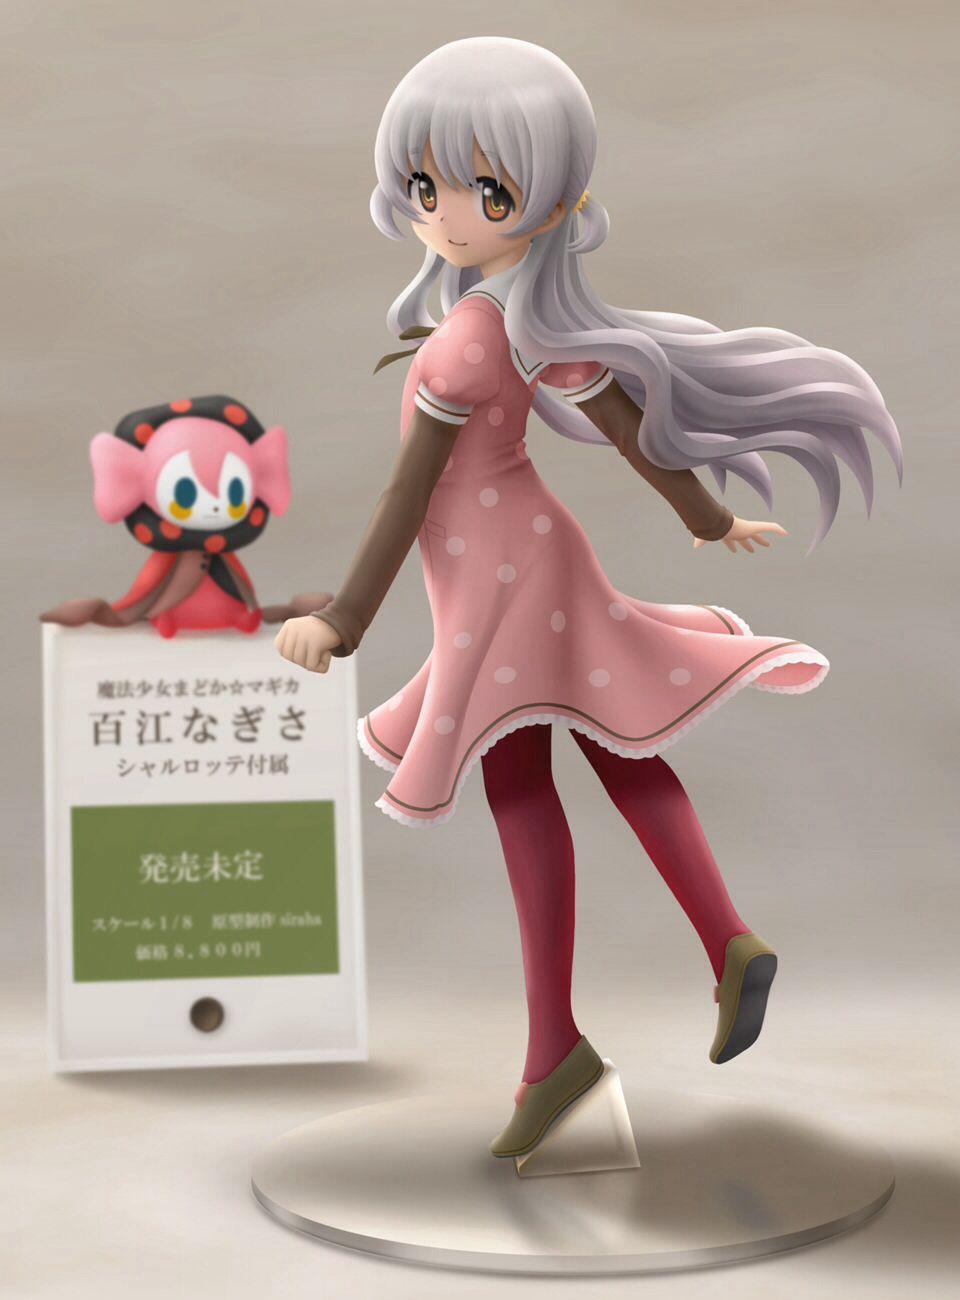 Anime figure anime figures anime characters anime dolls